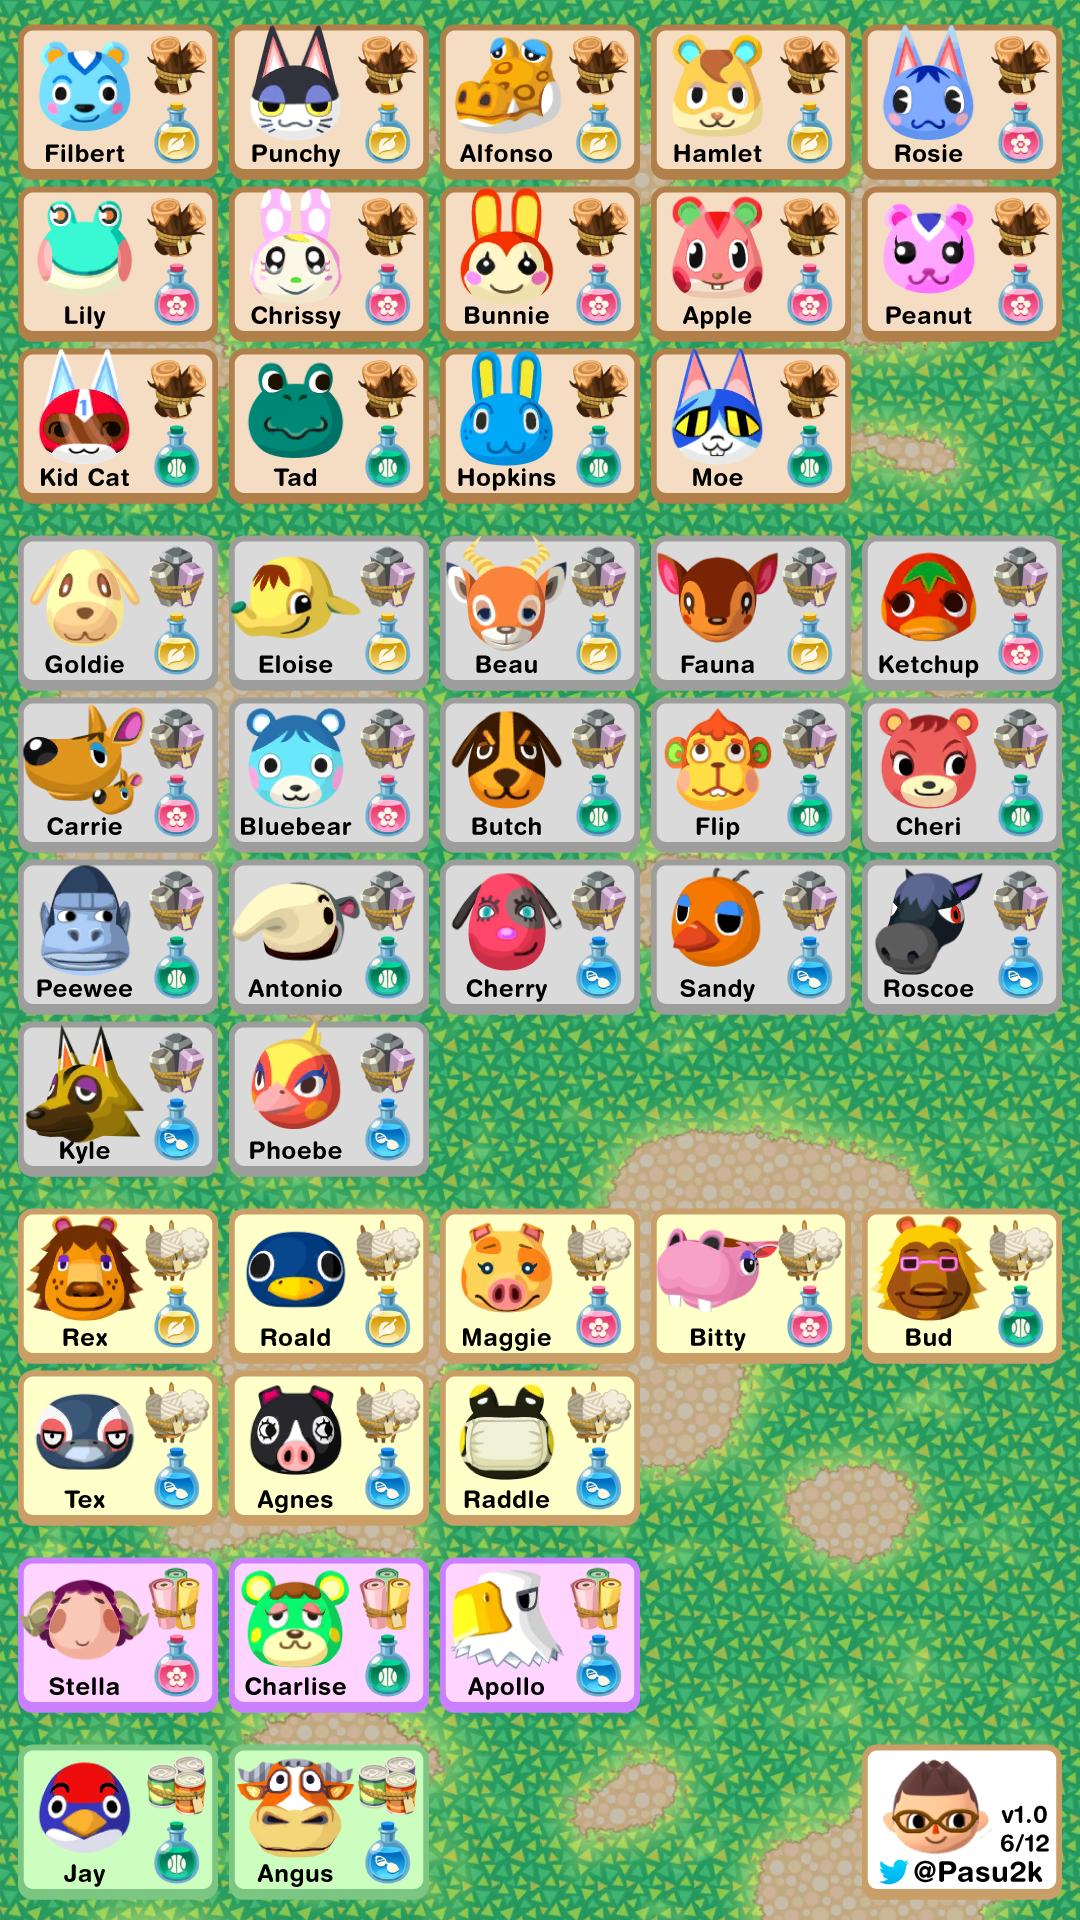 Animal Crossing Pocket Camp Animal crossing pocket camp